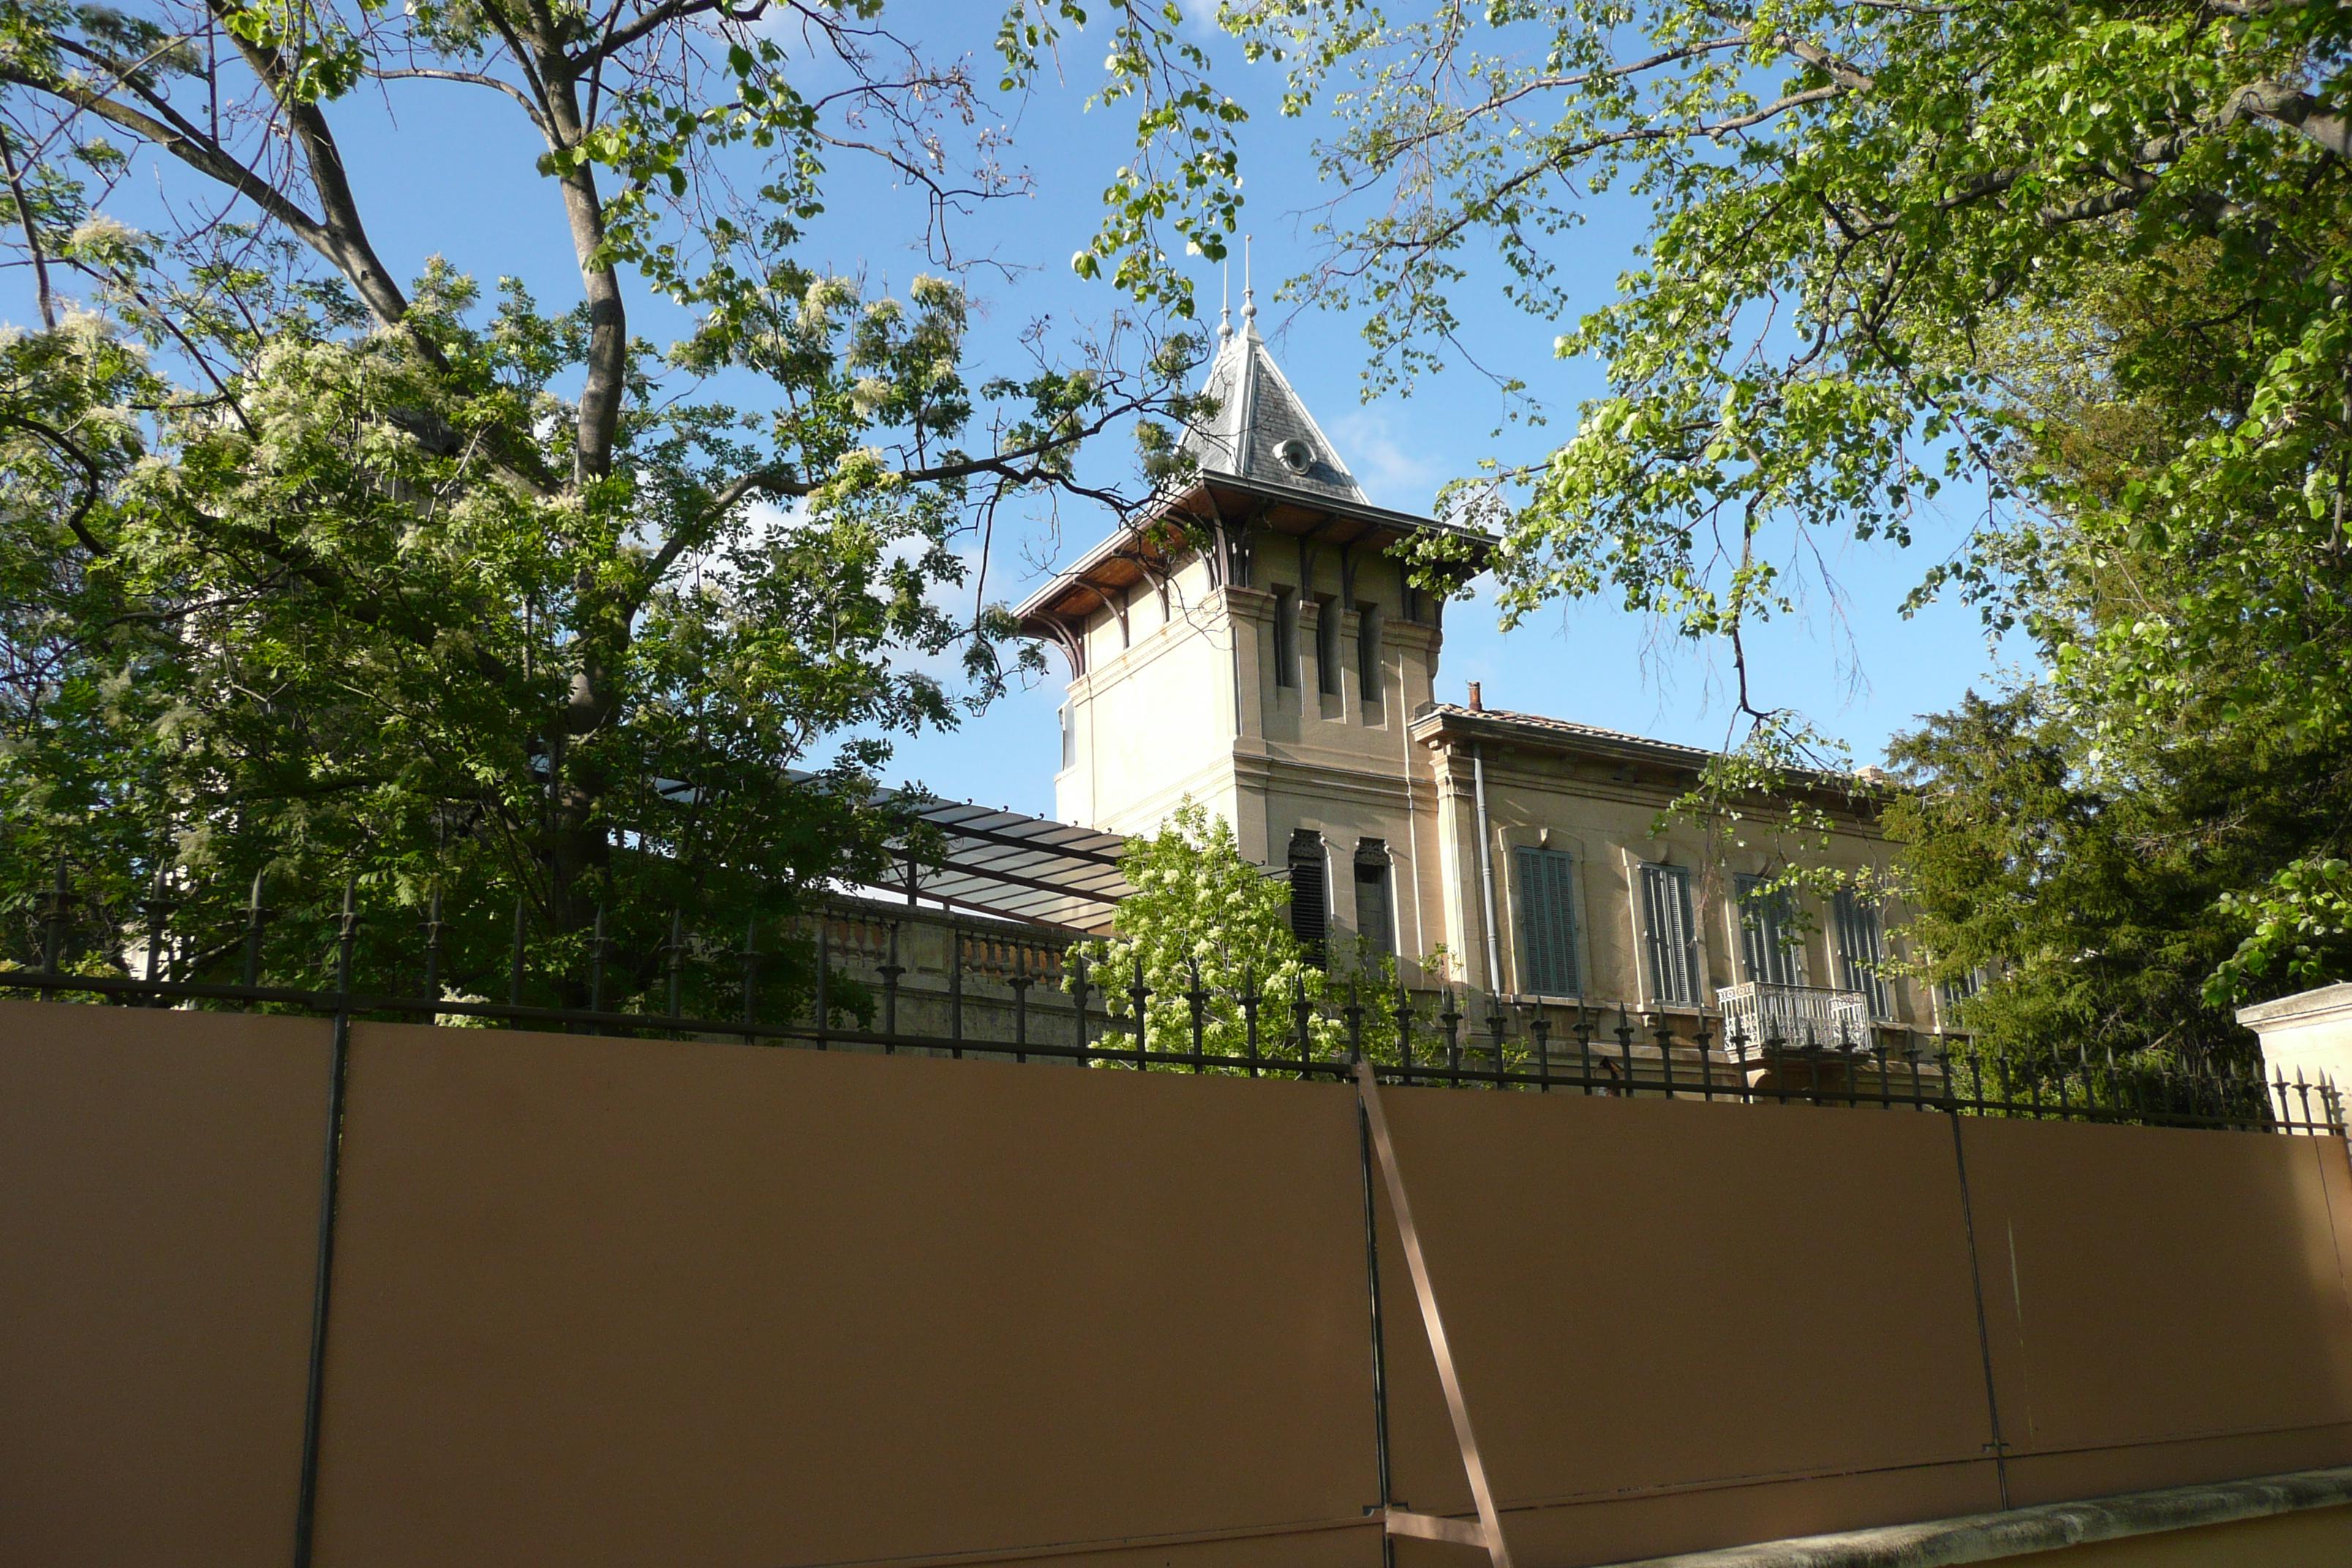 Salon De Jardin Original   Meuble En Resine Source D Inspiration ...